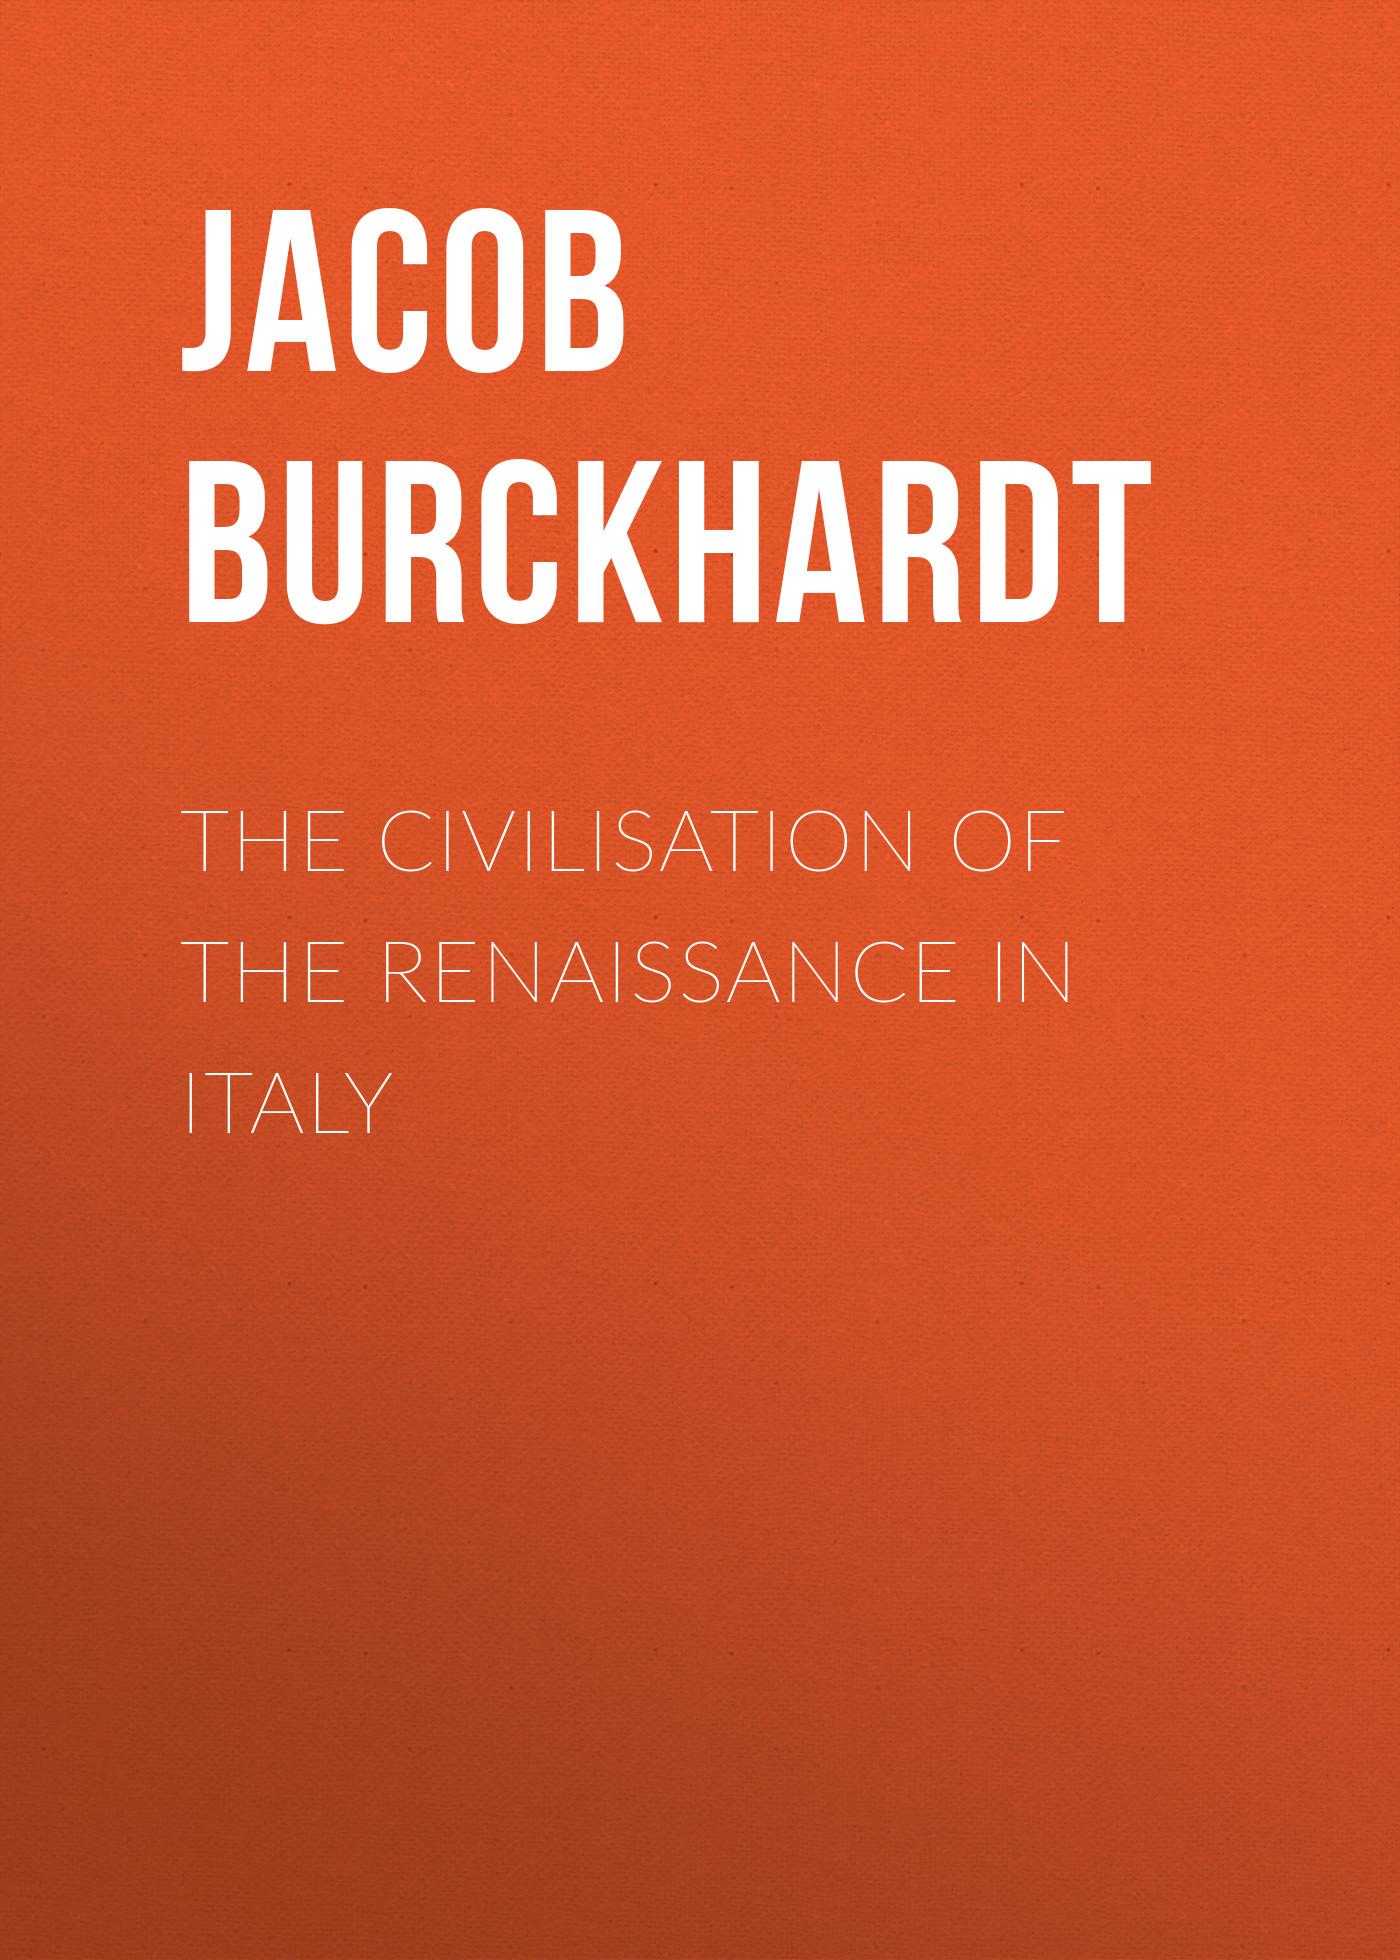 Jacob Burckhardt The Civilisation of the Renaissance in Italy abbott jacob darius the great